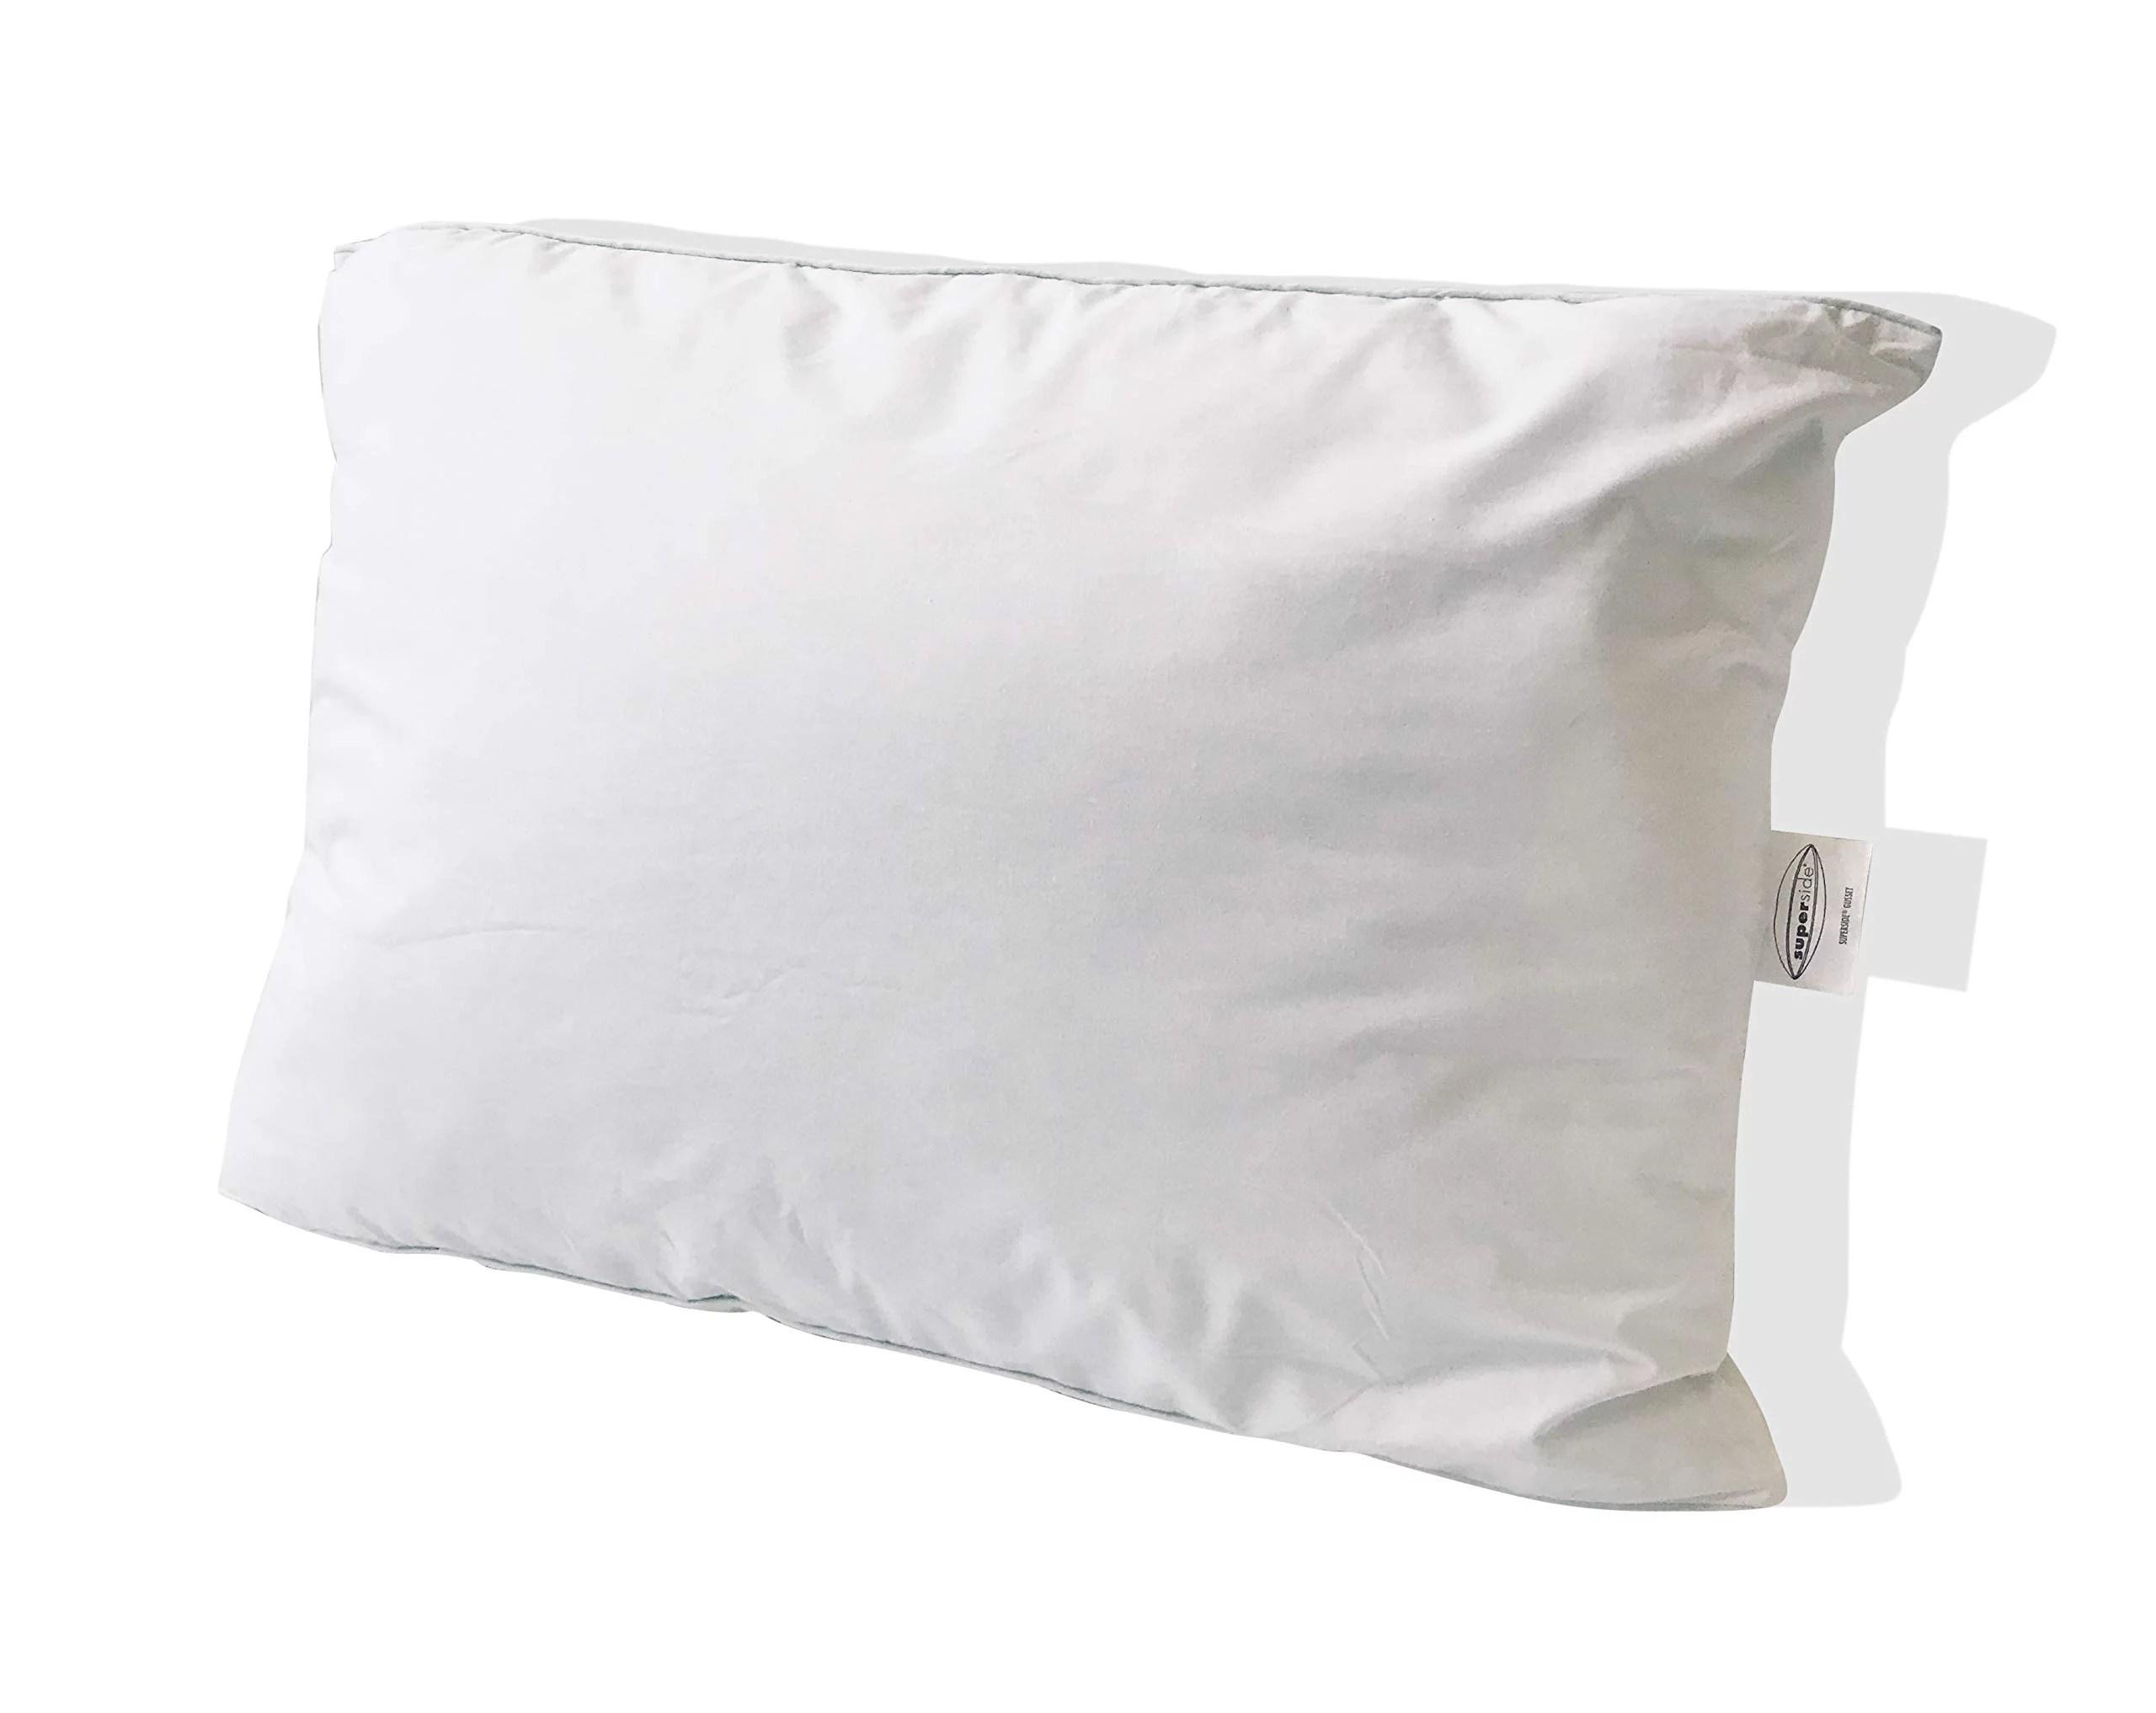 american hotel register registry superside gusseted 1 standard pillow